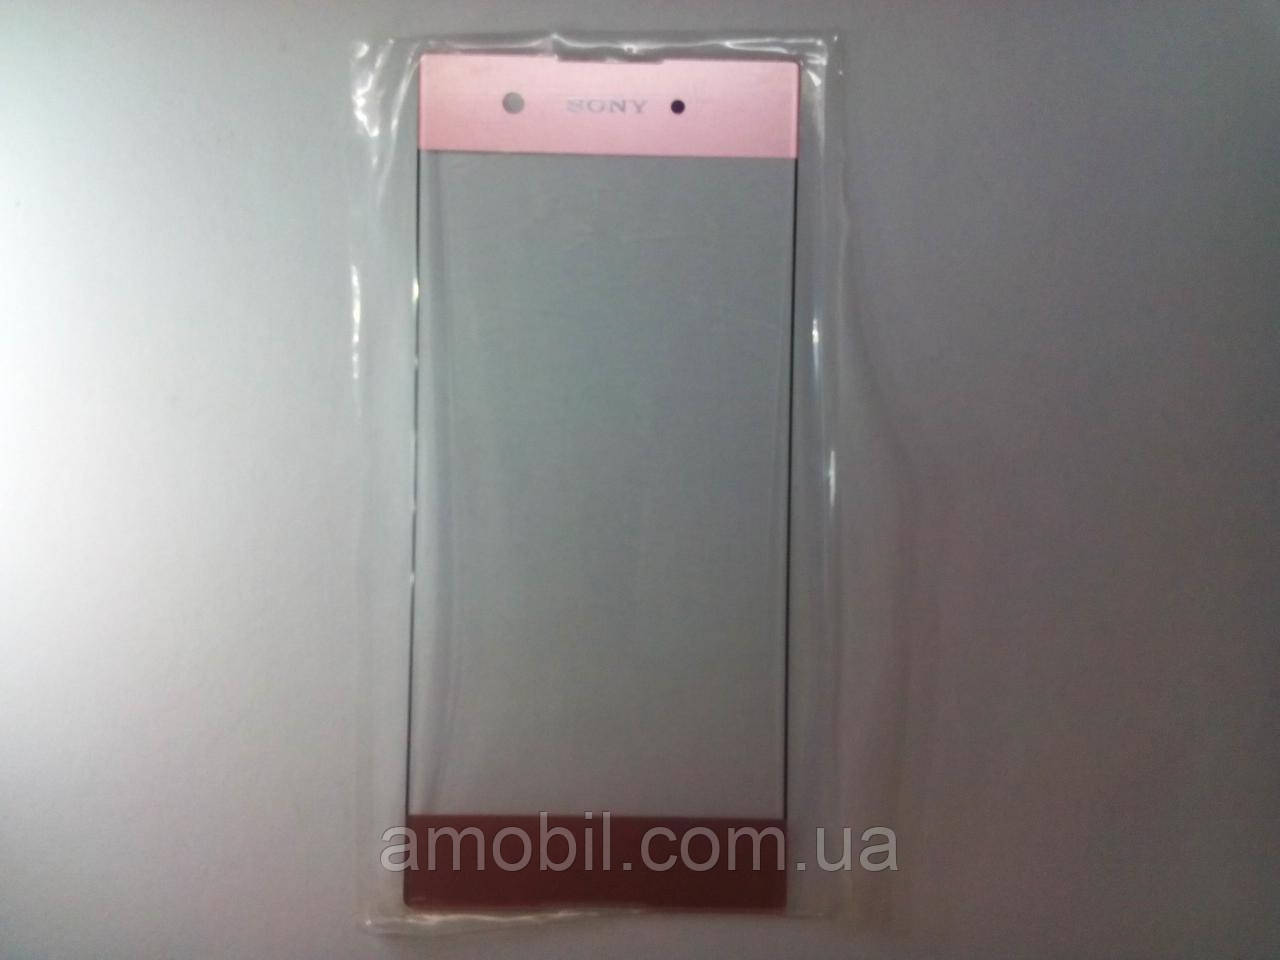 Скло Sony G3112 Xperia XA1 / G3116 Xperia XA1 / G3121 Xperia XA1 / G3123 Xperia XA1 / G3125 Xperia XA1 pink